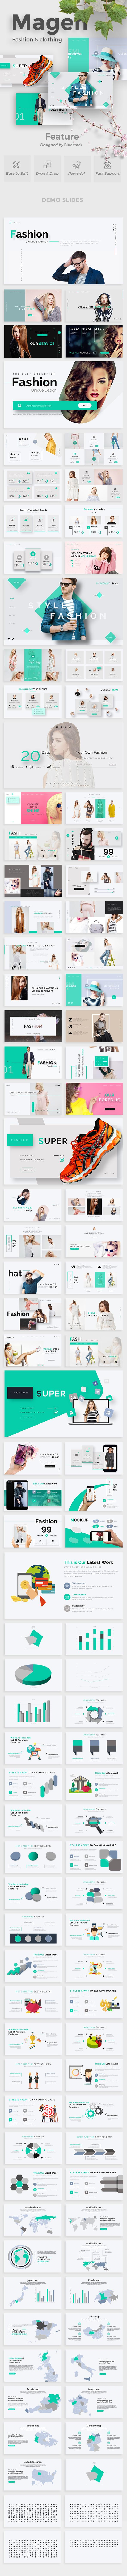 Magen Fashion & Clothing Google Slide Template - Google Slides Presentation Templates